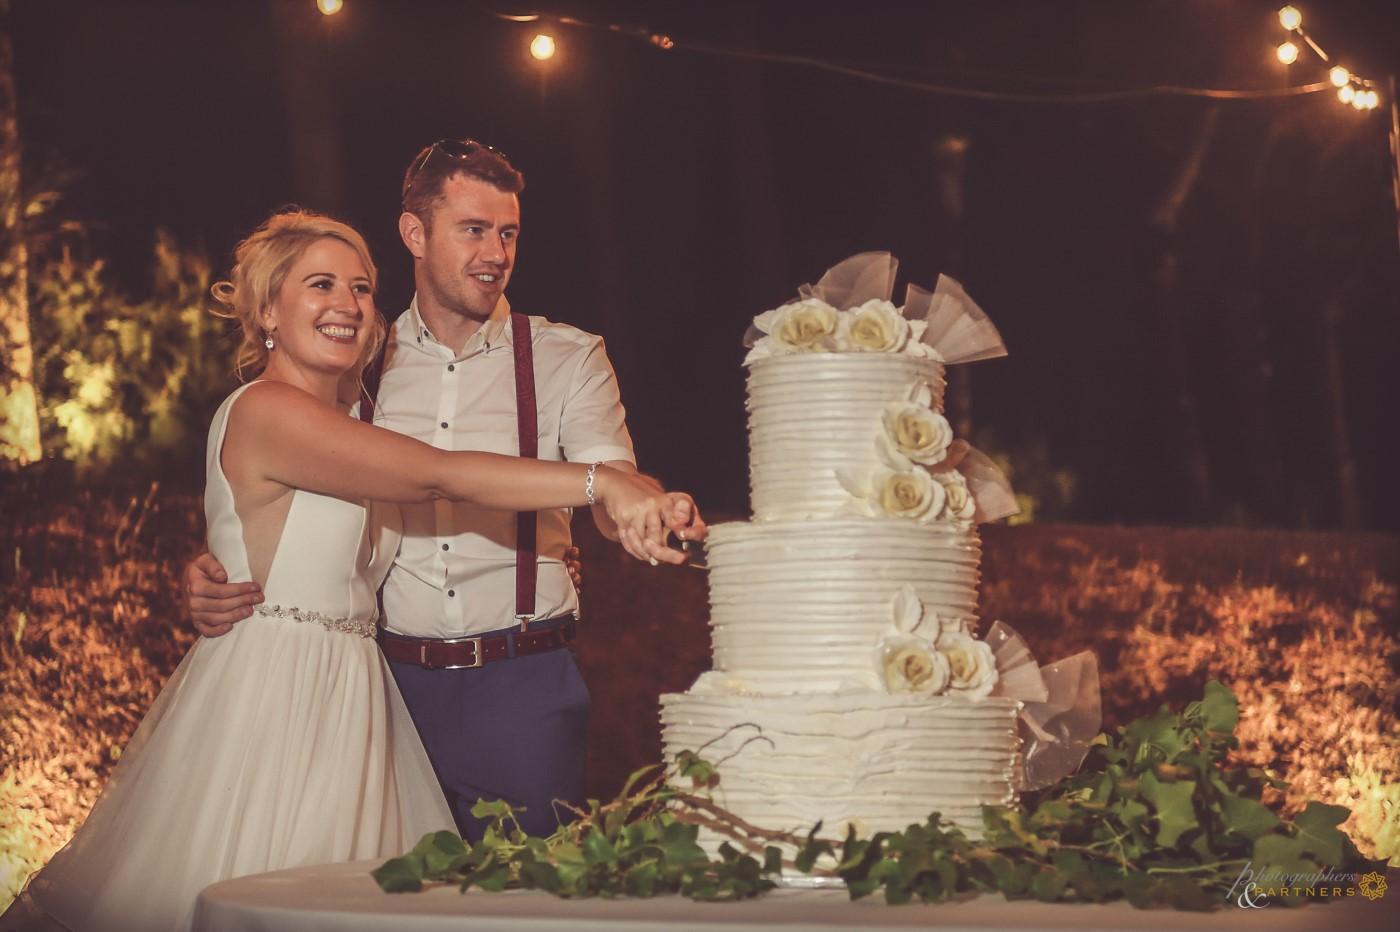 Wedding cake cutting 🍰